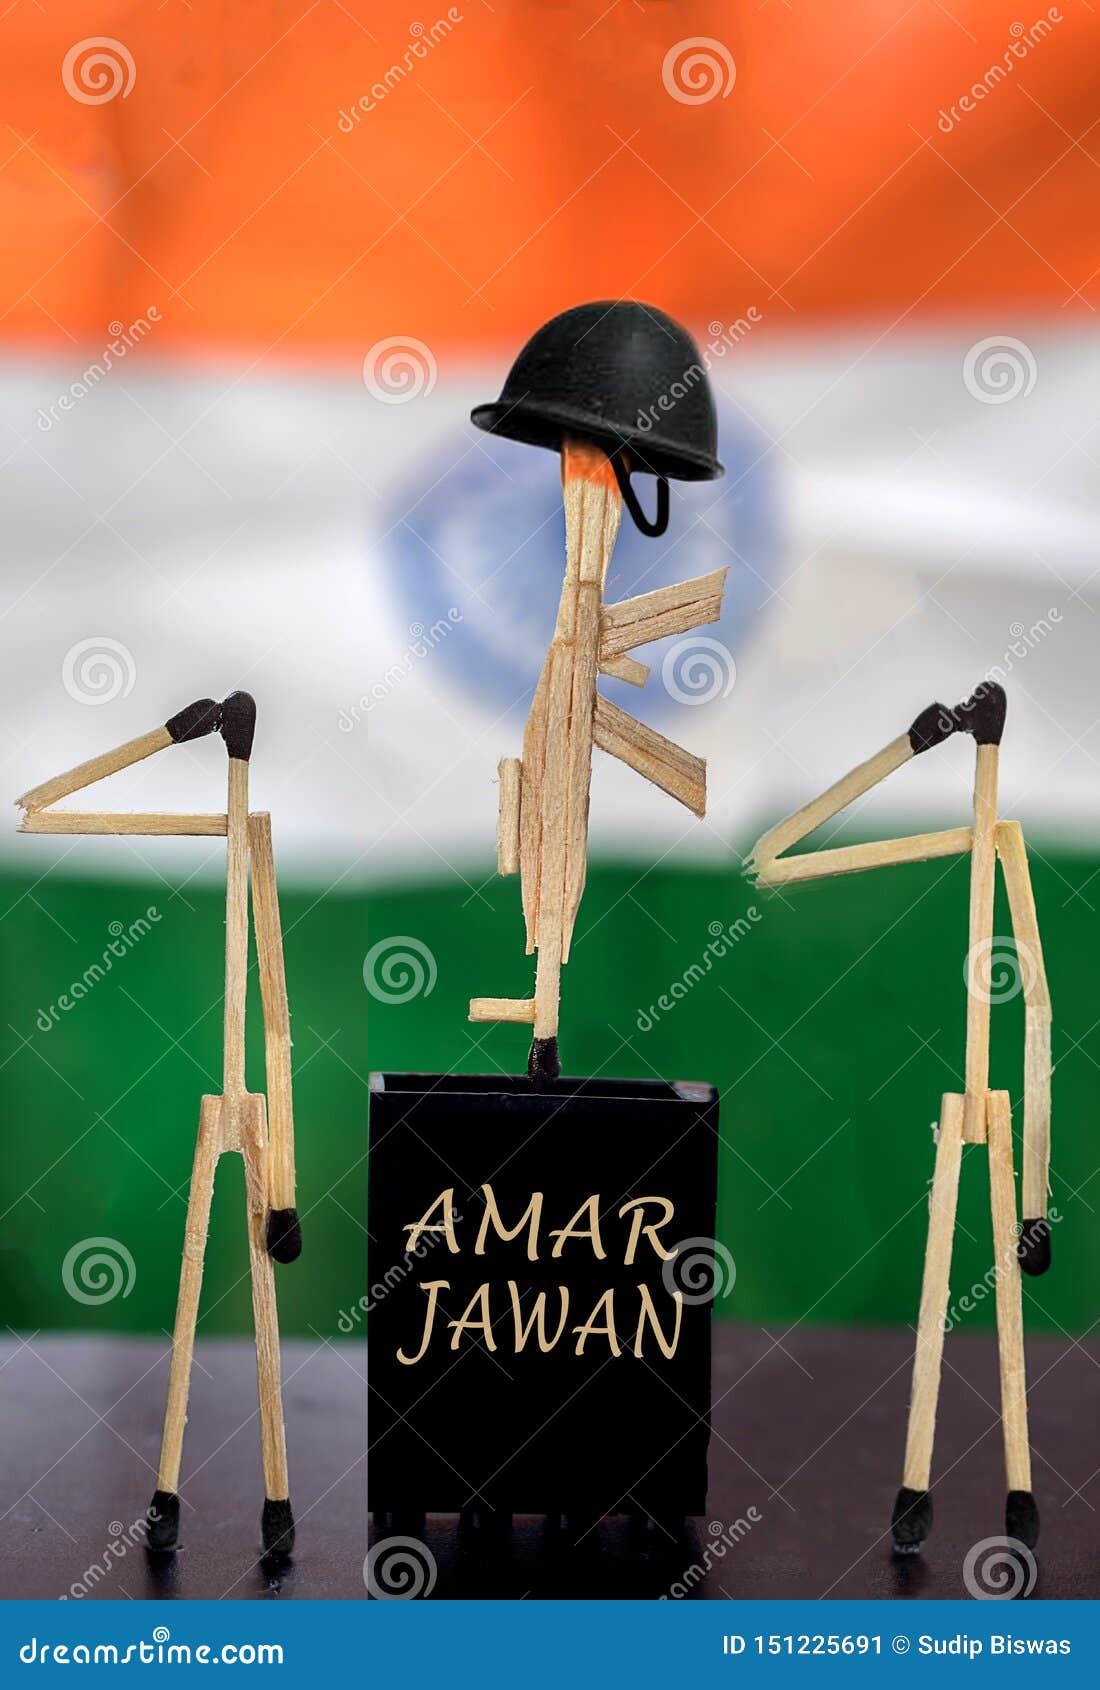 Kreative Fotografie von Amar Jawanusing Matches Stick